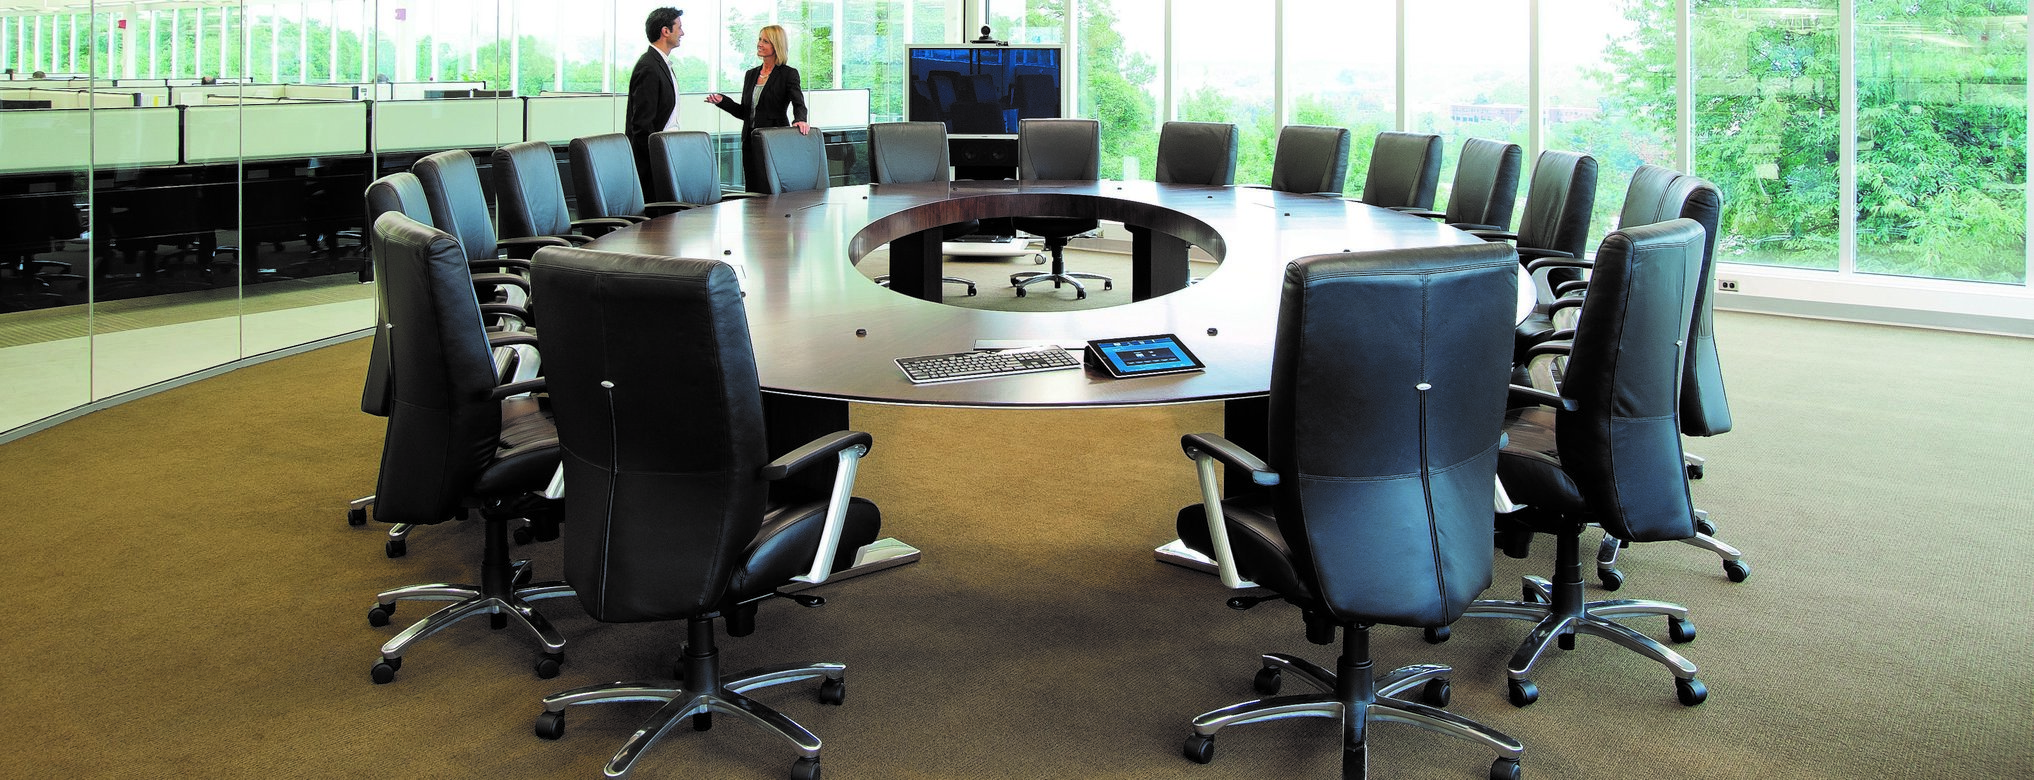 rsz_faef_boardroom (1).jpg